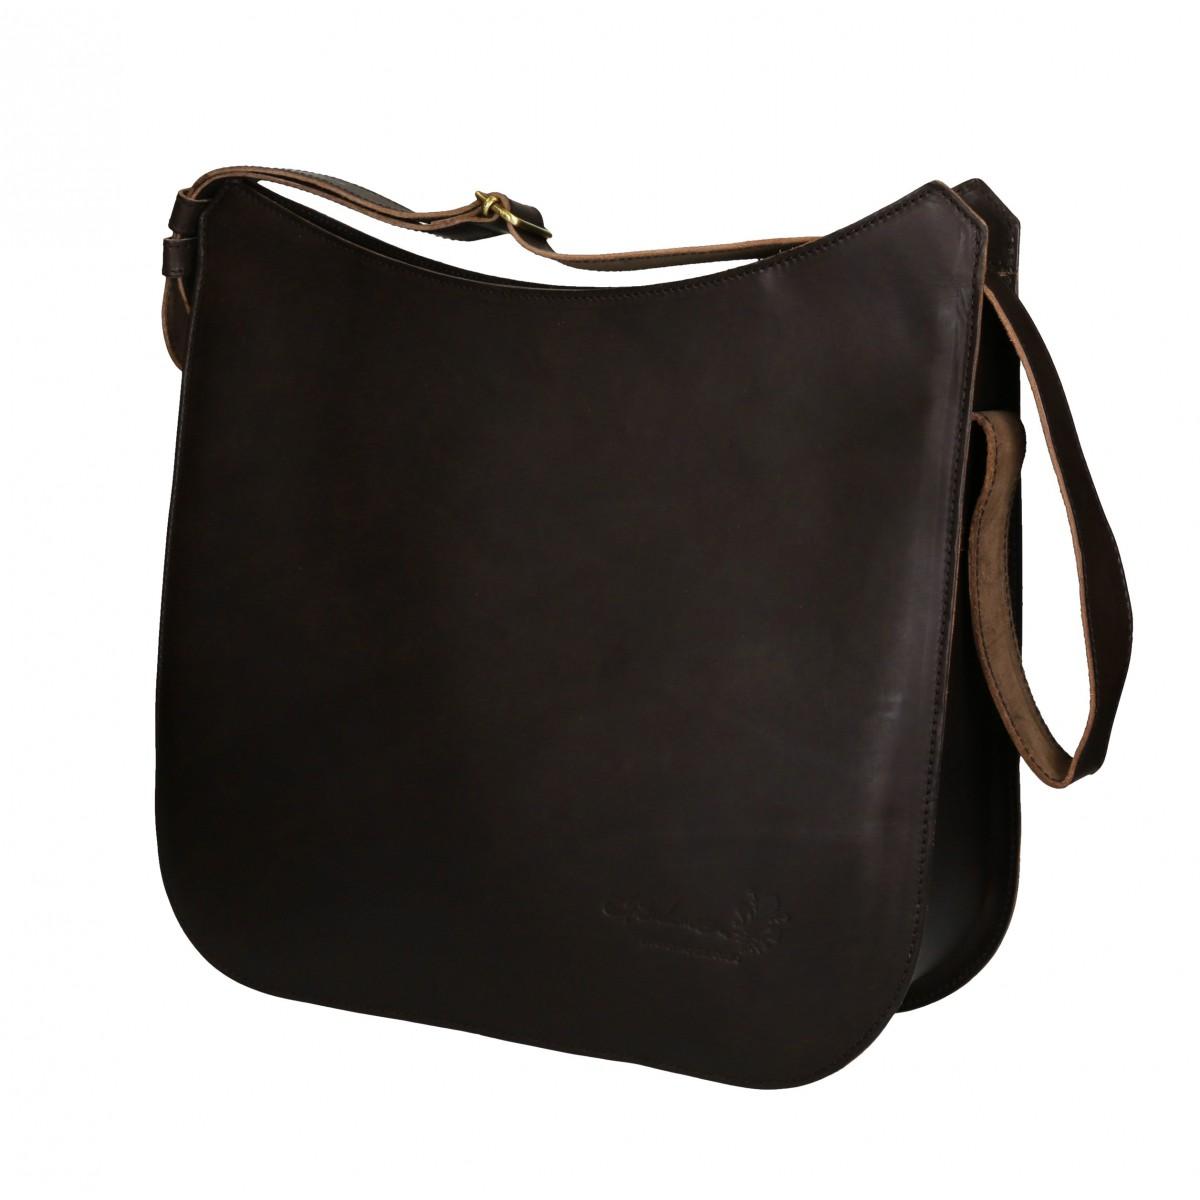 Handmade Brown Leather Across Shoulder Bag Gianluca